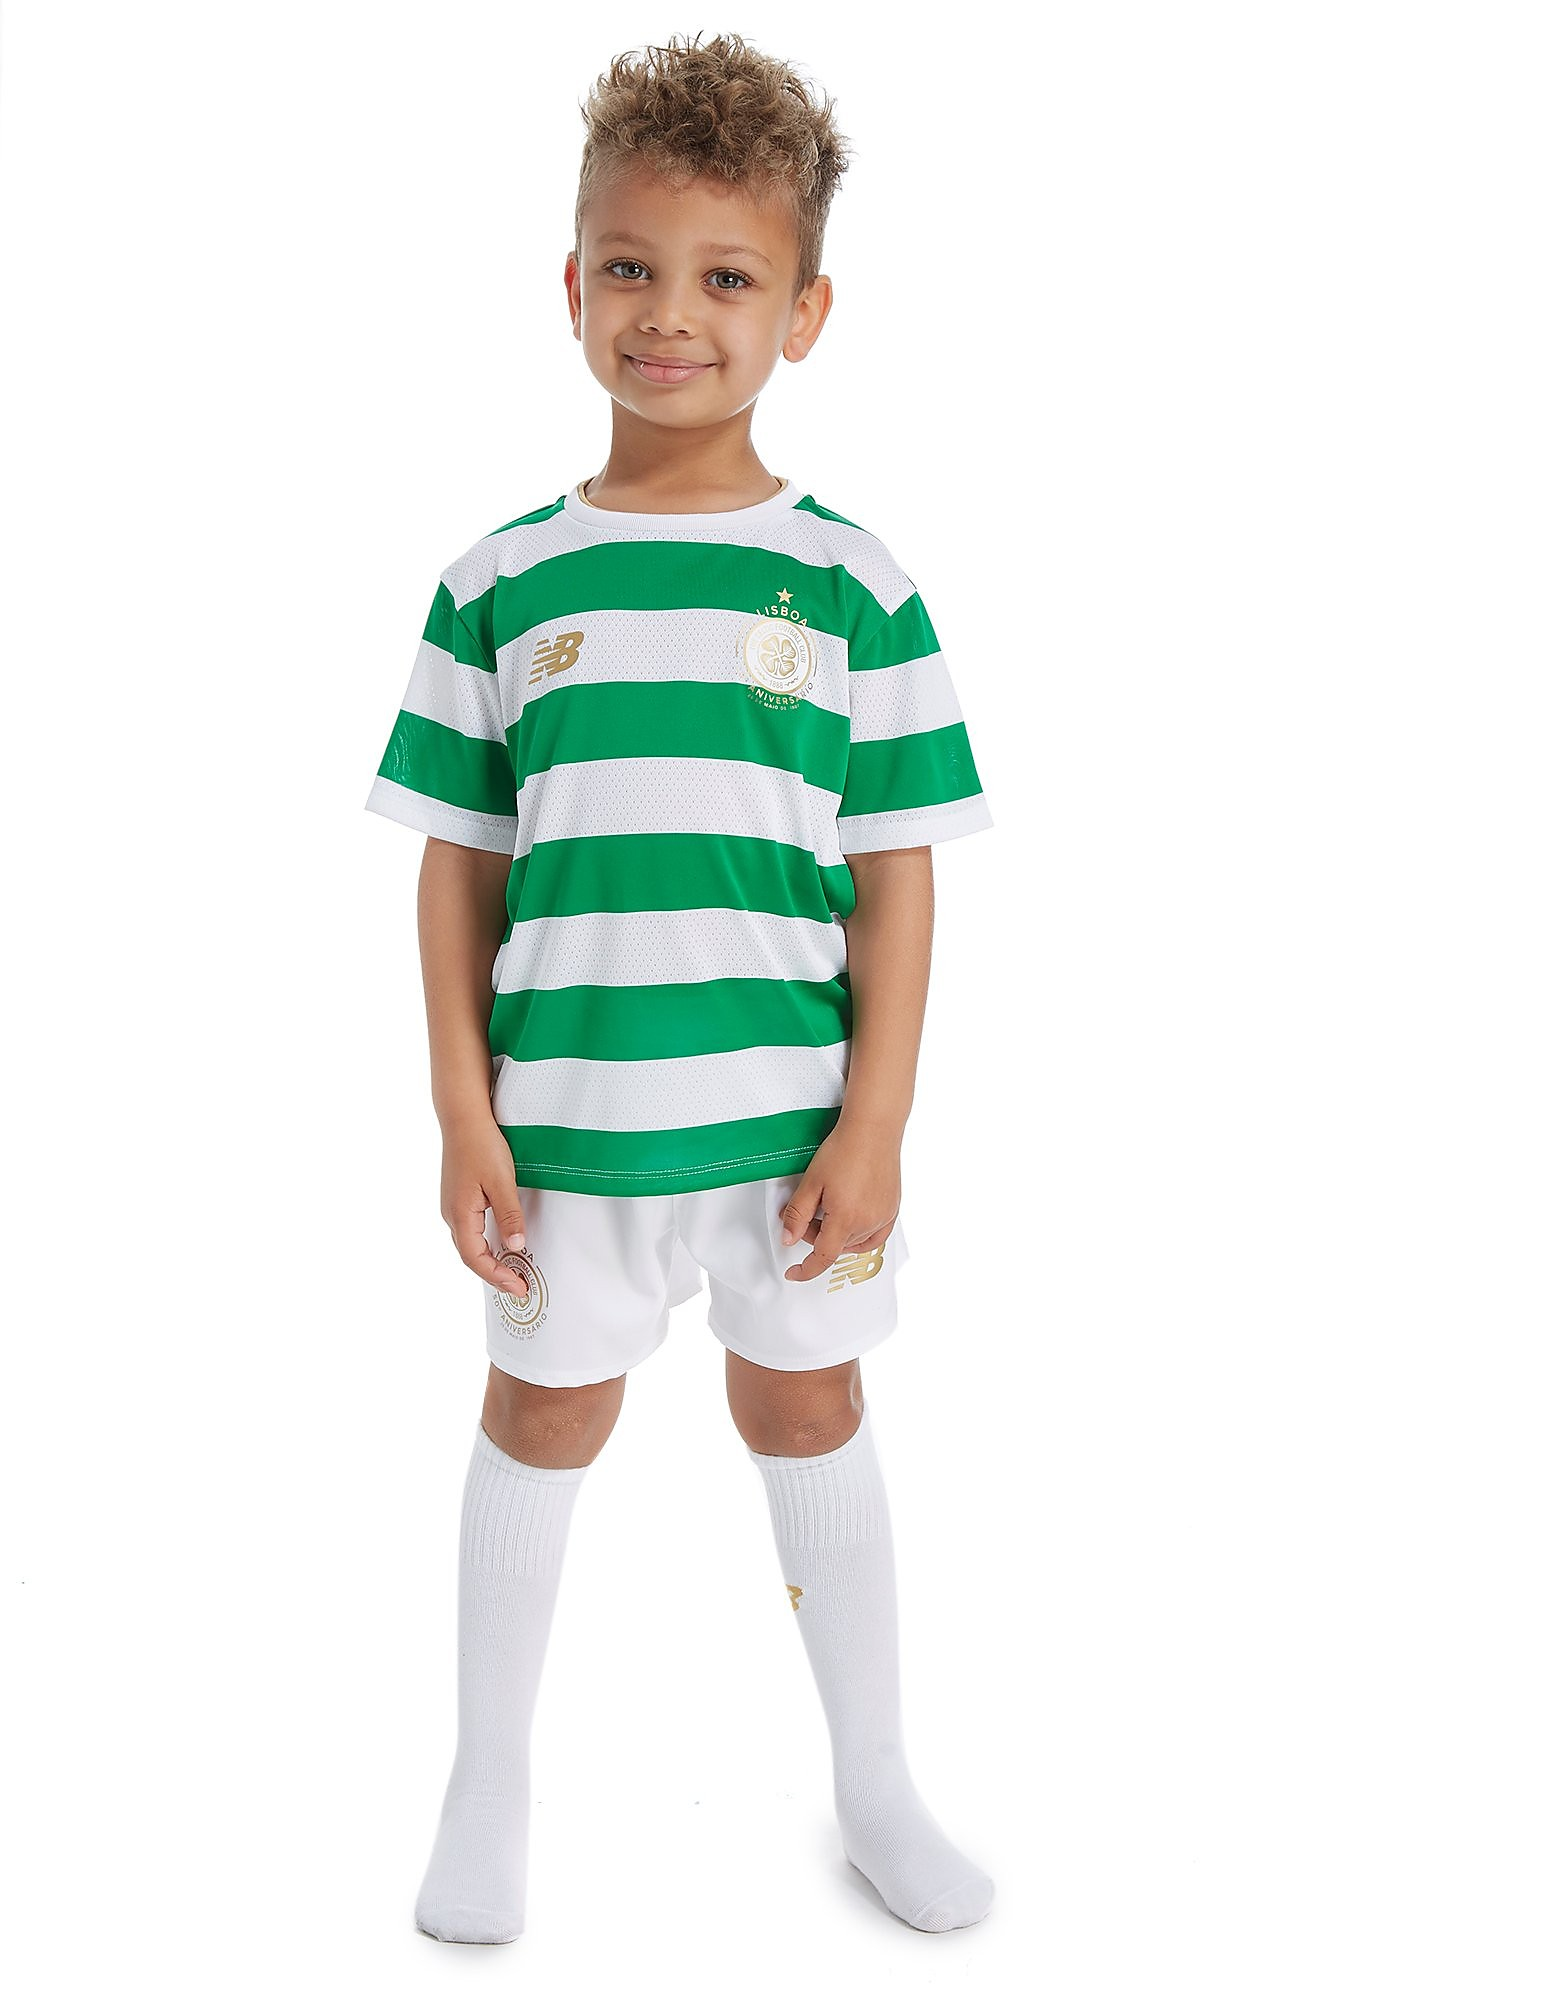 New Balance conjunto Celtic FC 2017/18 1.ª equipación infantil